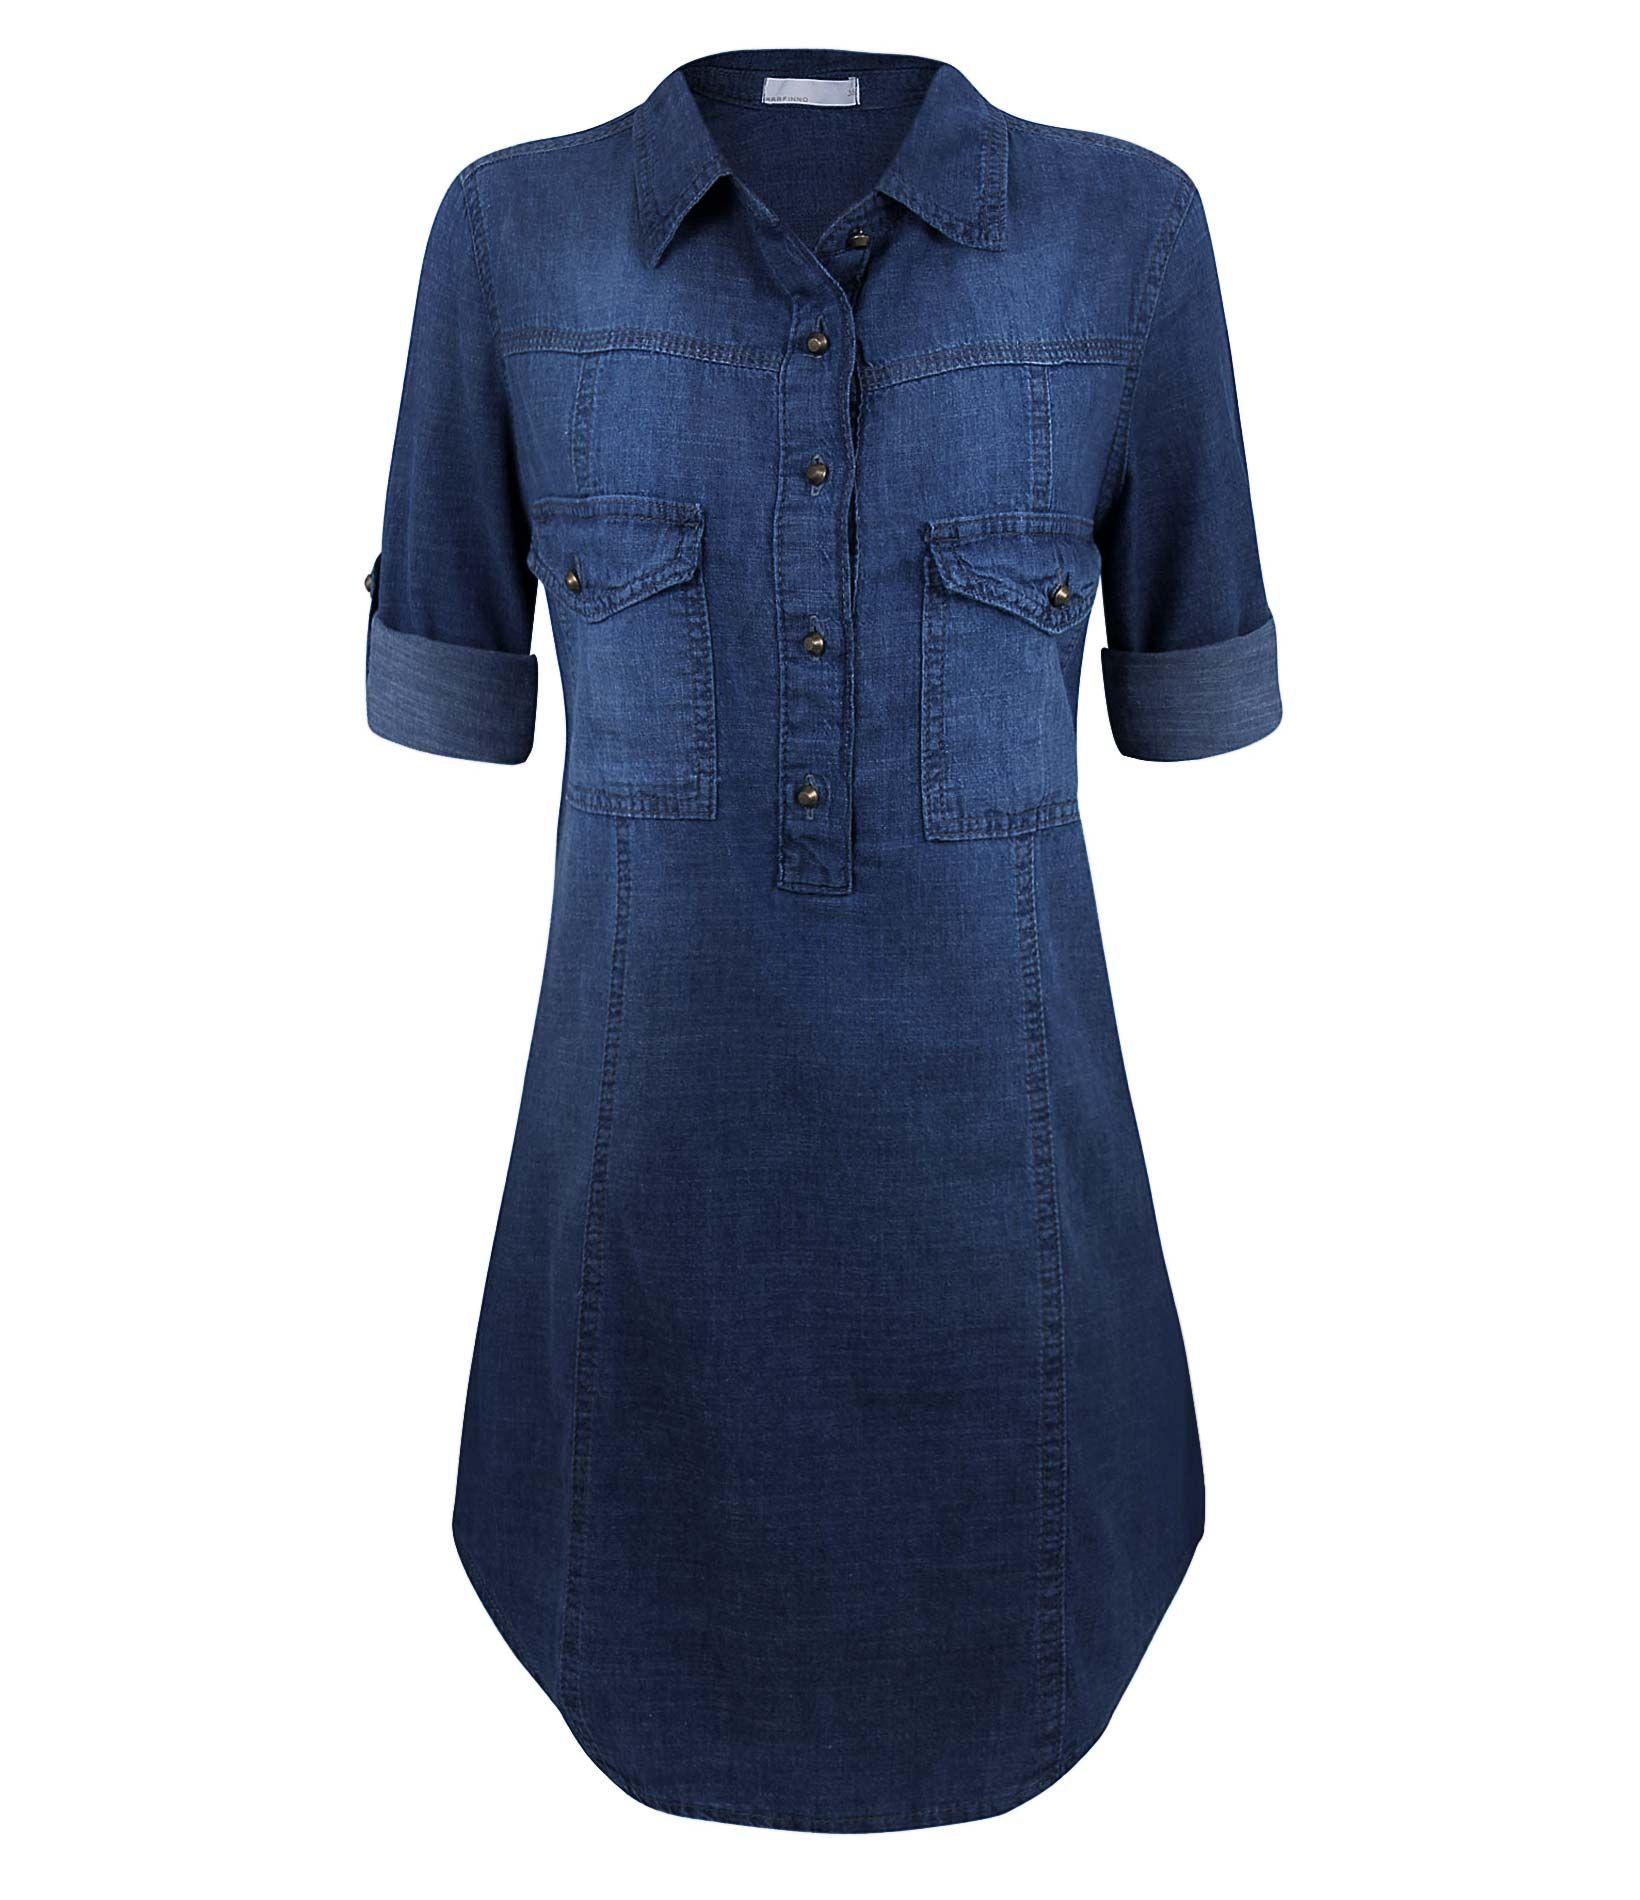 9f097a8271 Camisa Feminina Alongada em Jeans - Lojas Renner